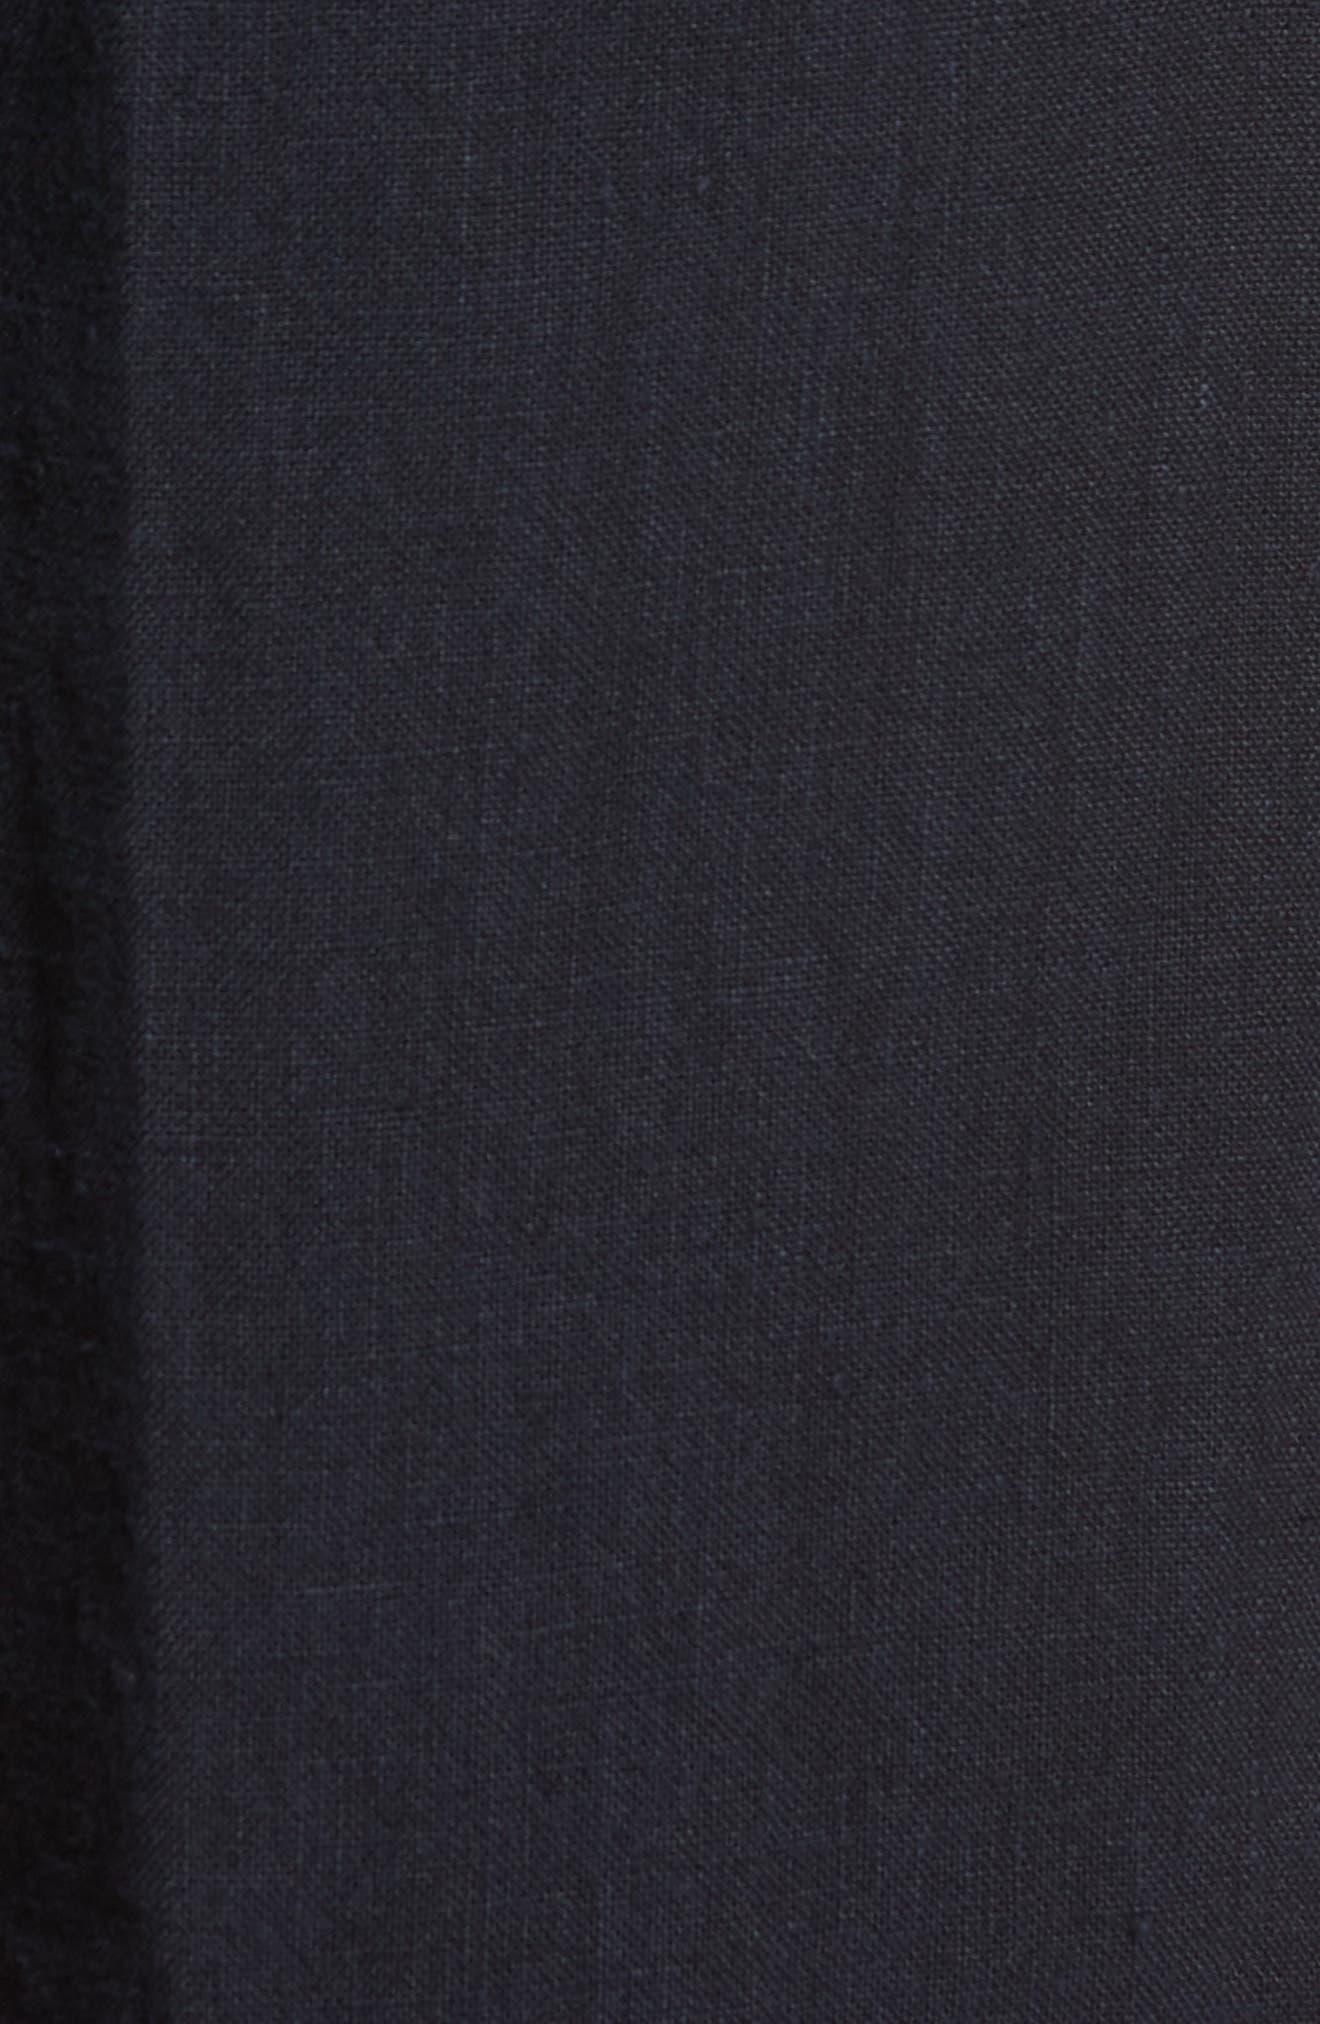 & Bros. Linen Shorts,                             Alternate thumbnail 5, color,                             Alpine Navy